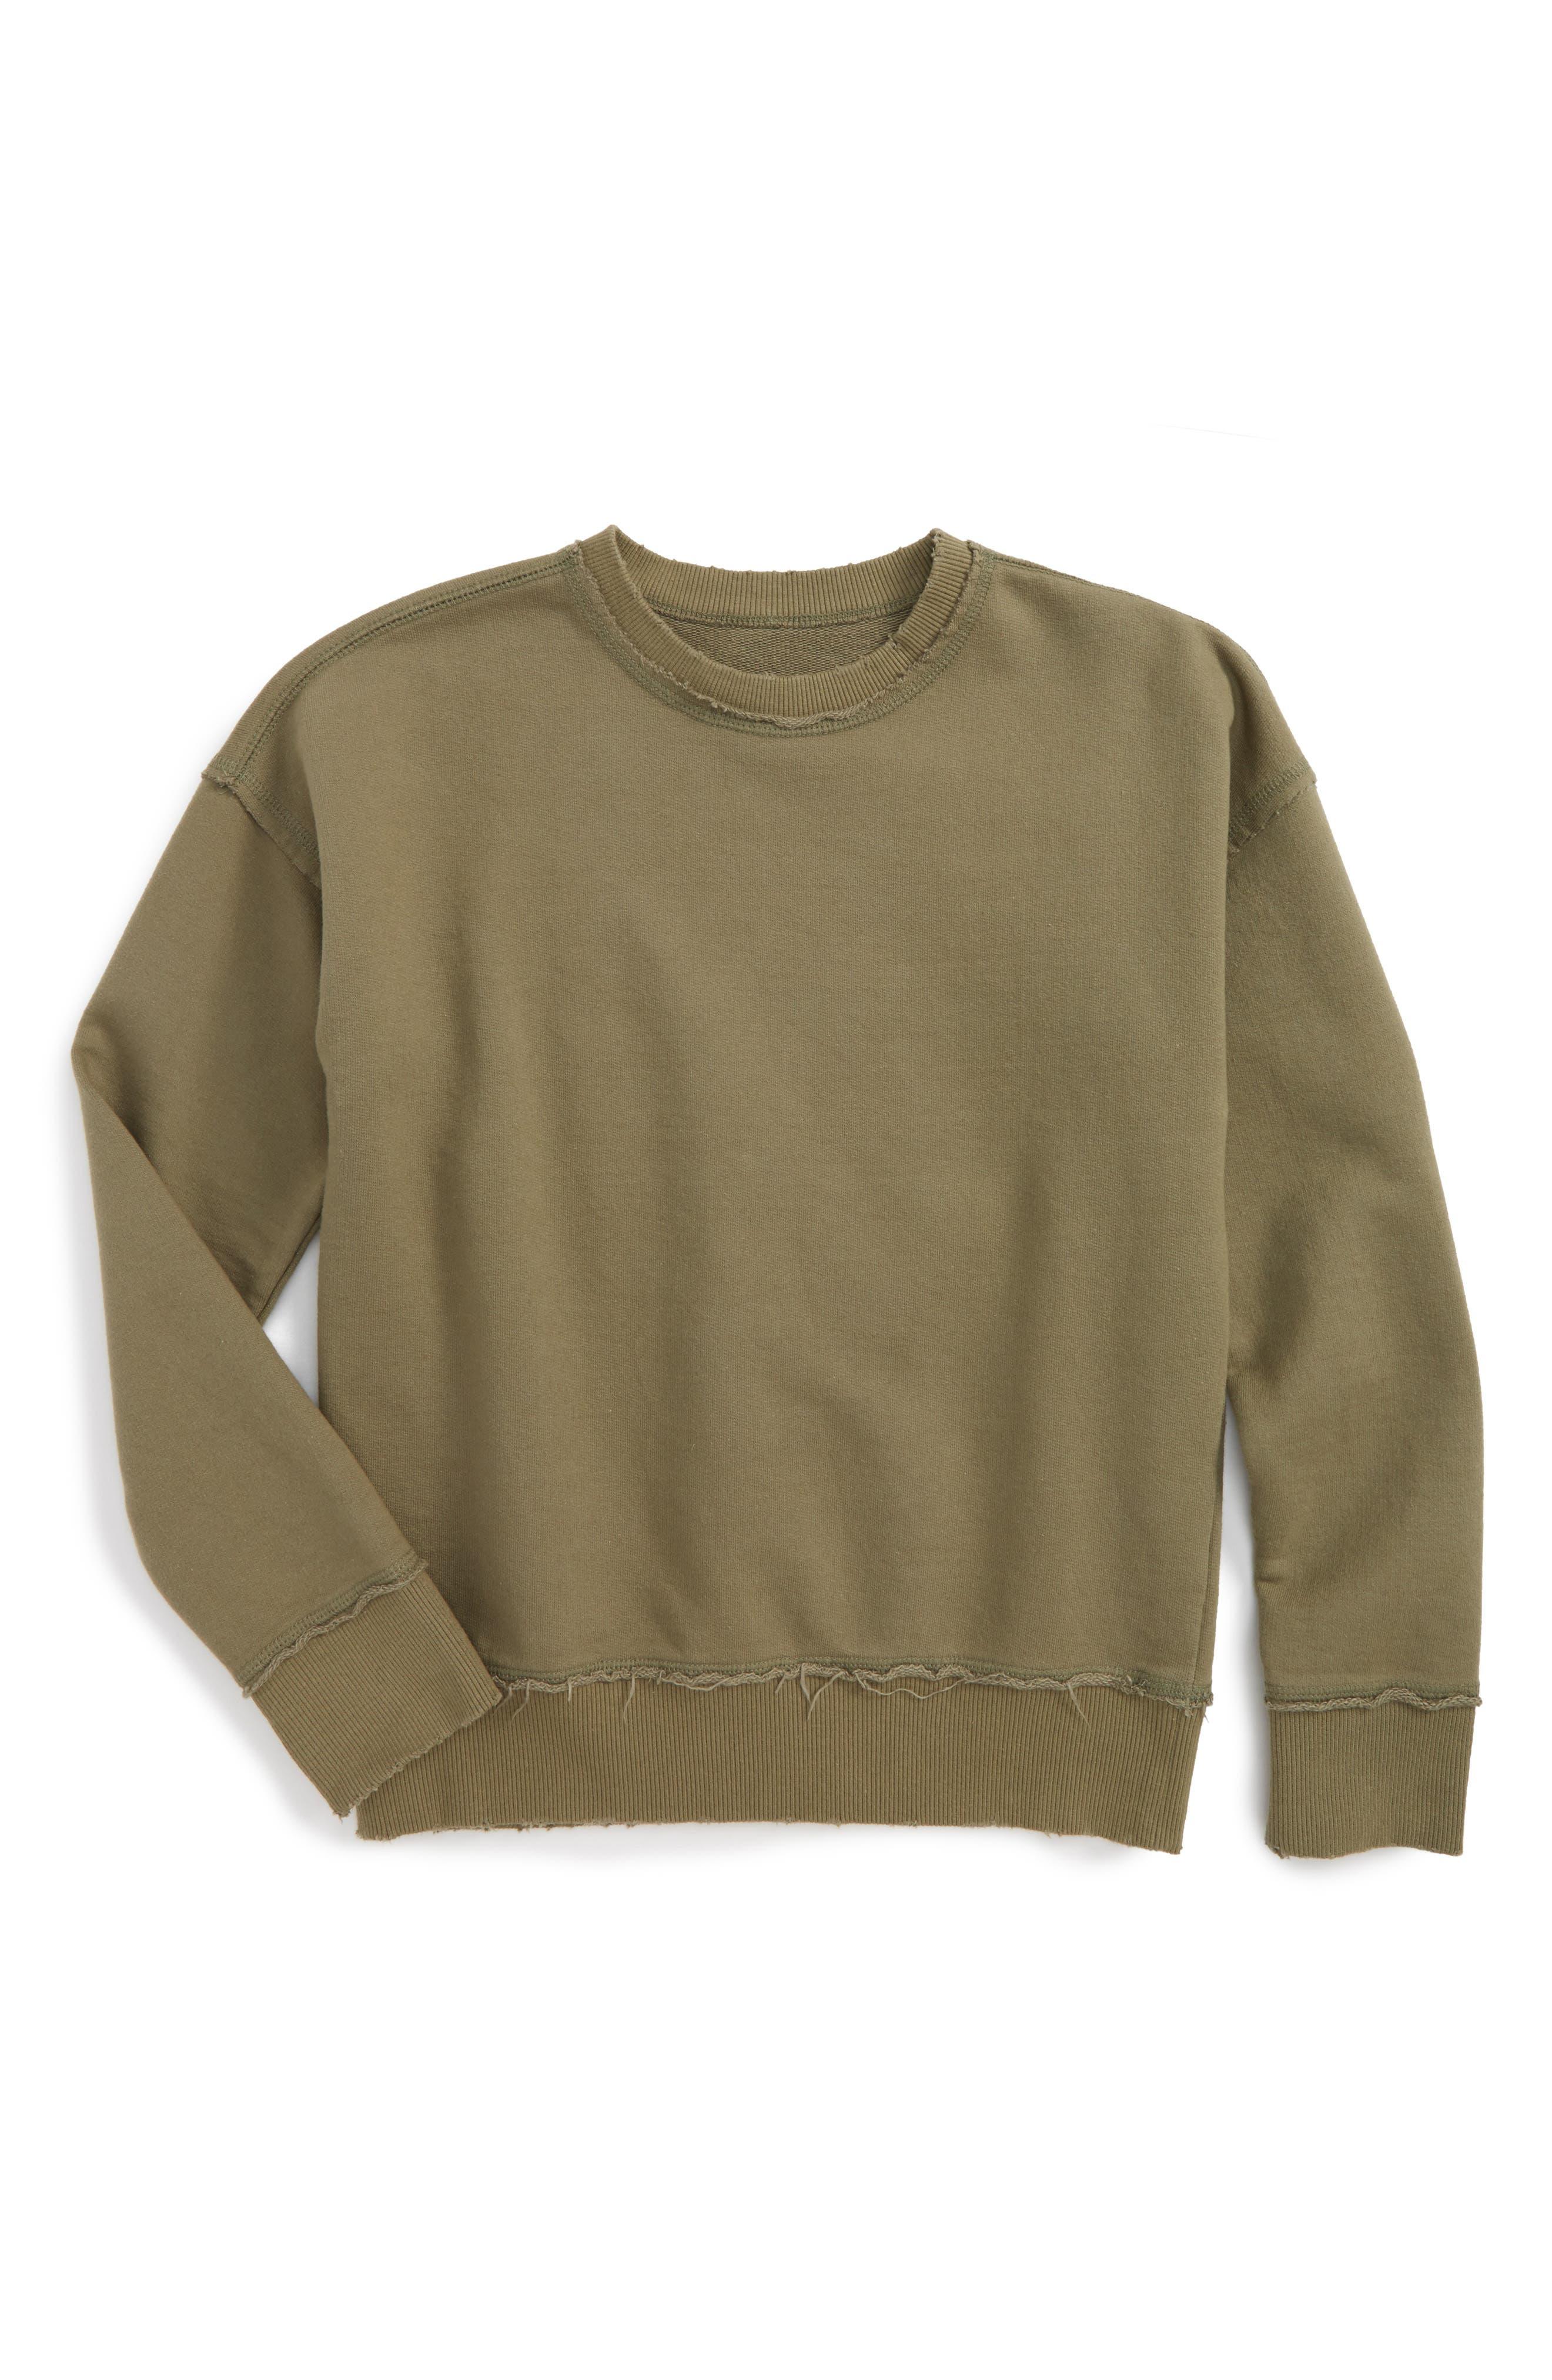 Main Image - Treasure & Bond Raw Edge Crewneck Sweatshirt (Big Boys)